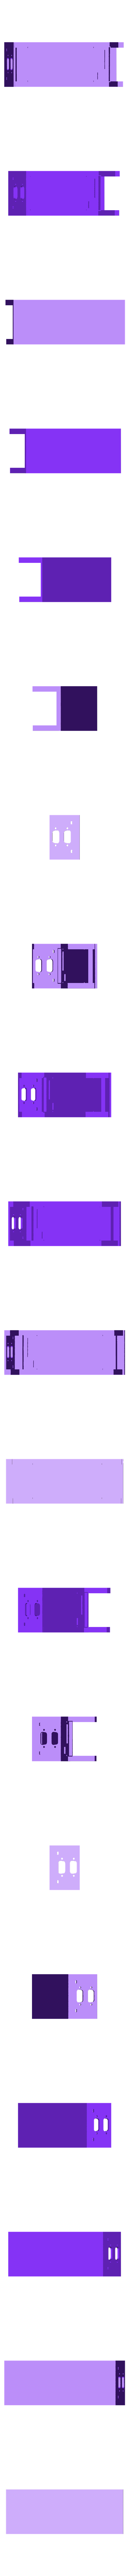 3Cuerpo_Tally_universal.stl Download free STL file JVC RM-LP100 Tally Box (arduino optocoupler circuit box) • 3D printing model, CMH